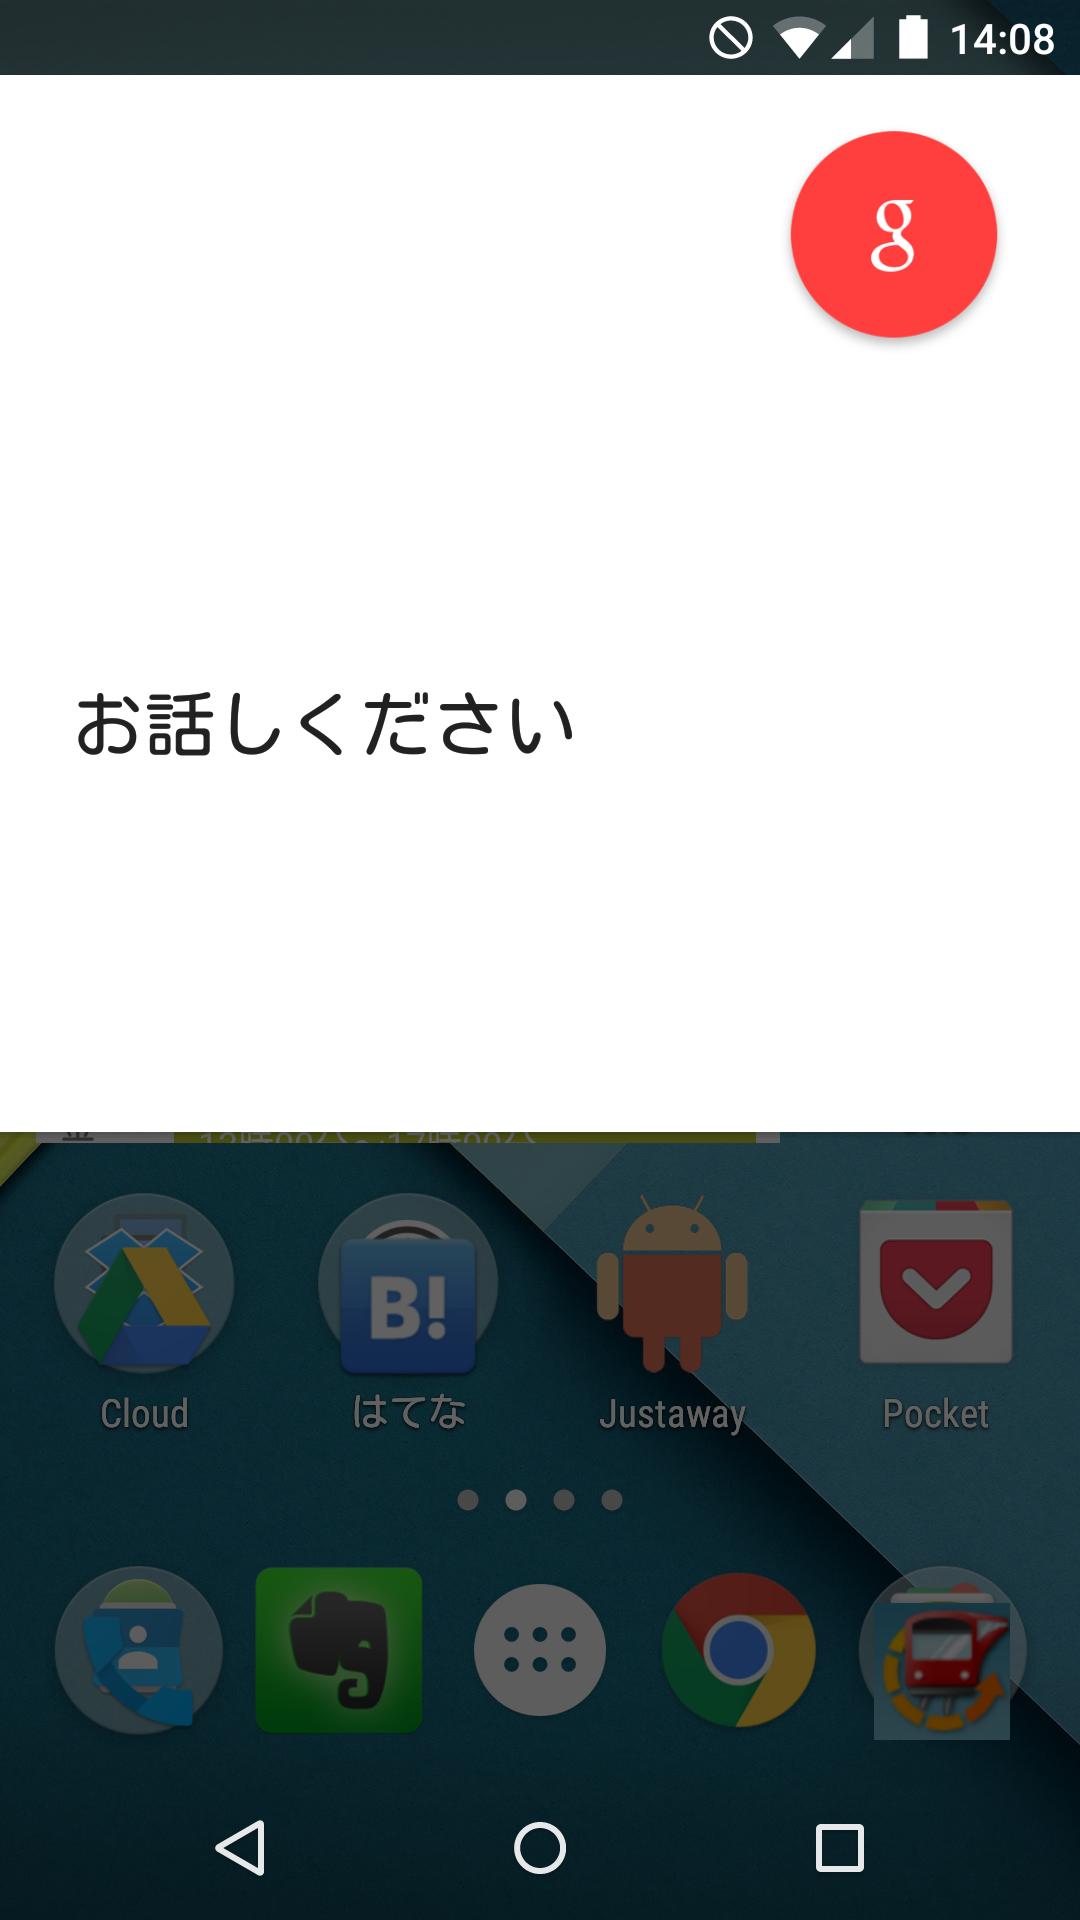 OTAでAndroid 5.0 LolipopにアップデートしたNexus 5のマイクが動作しない件